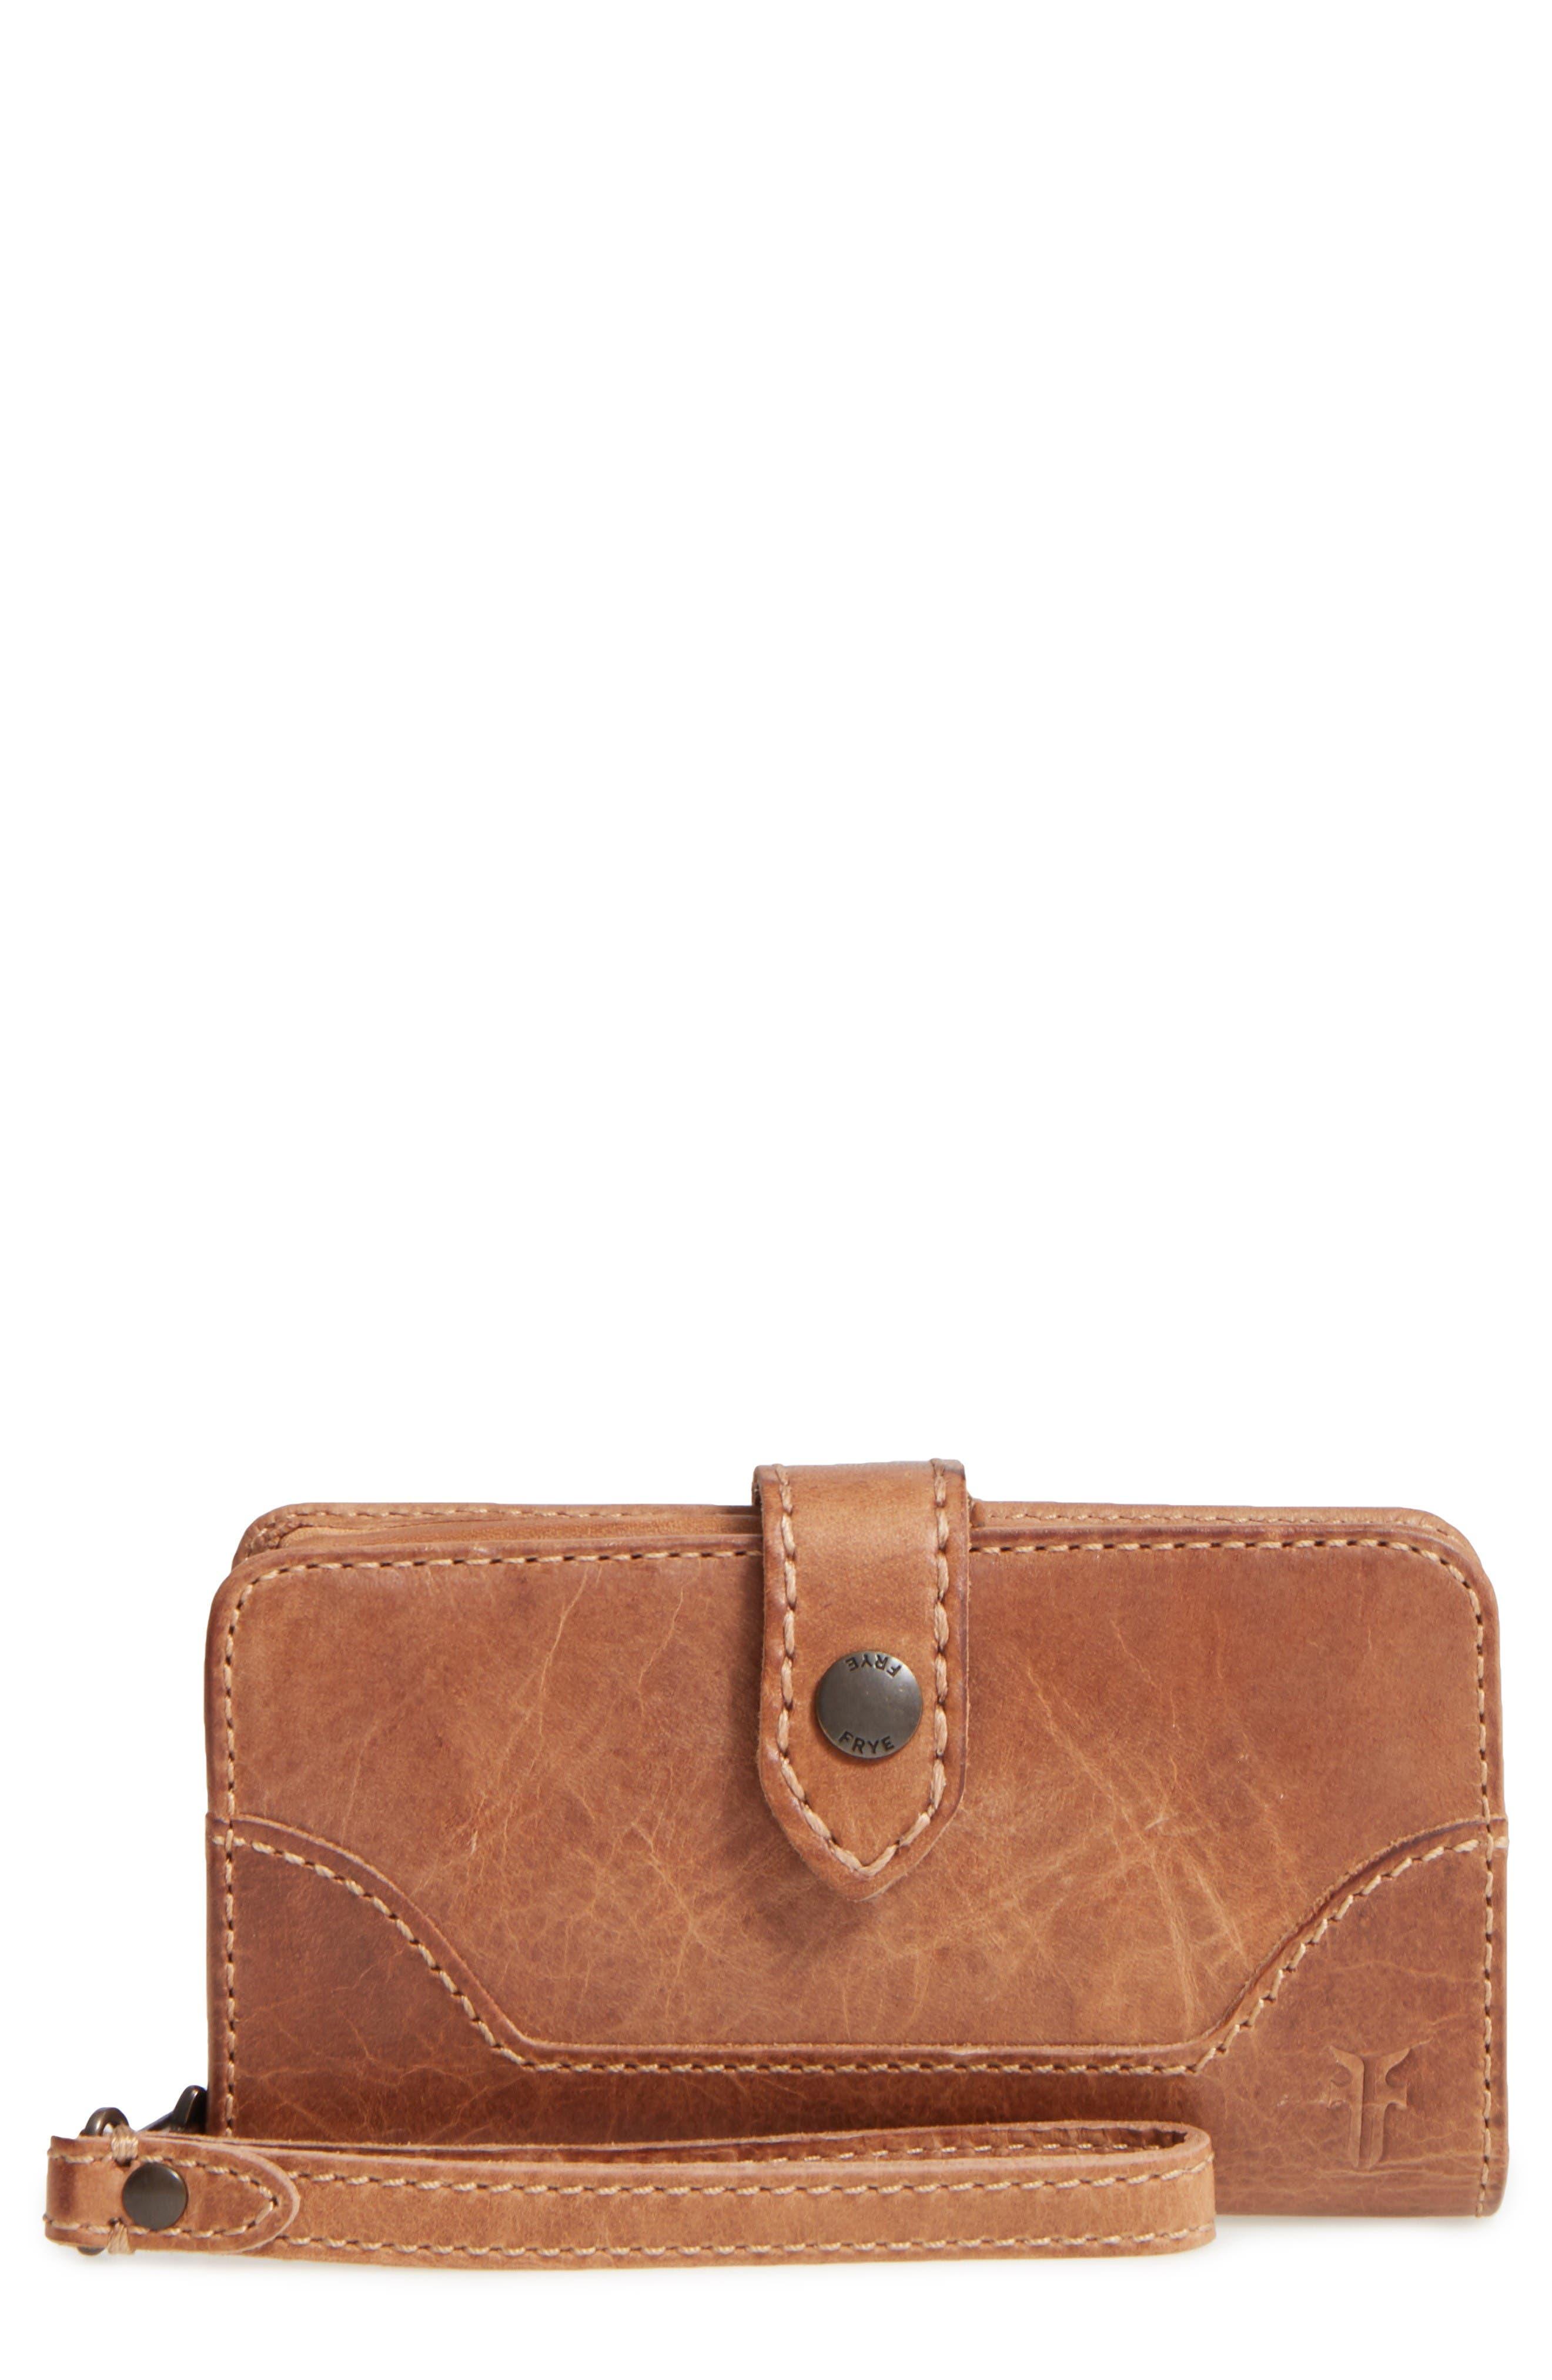 'Melissa' Leather Phone Wallet,                         Main,                         color, Beige